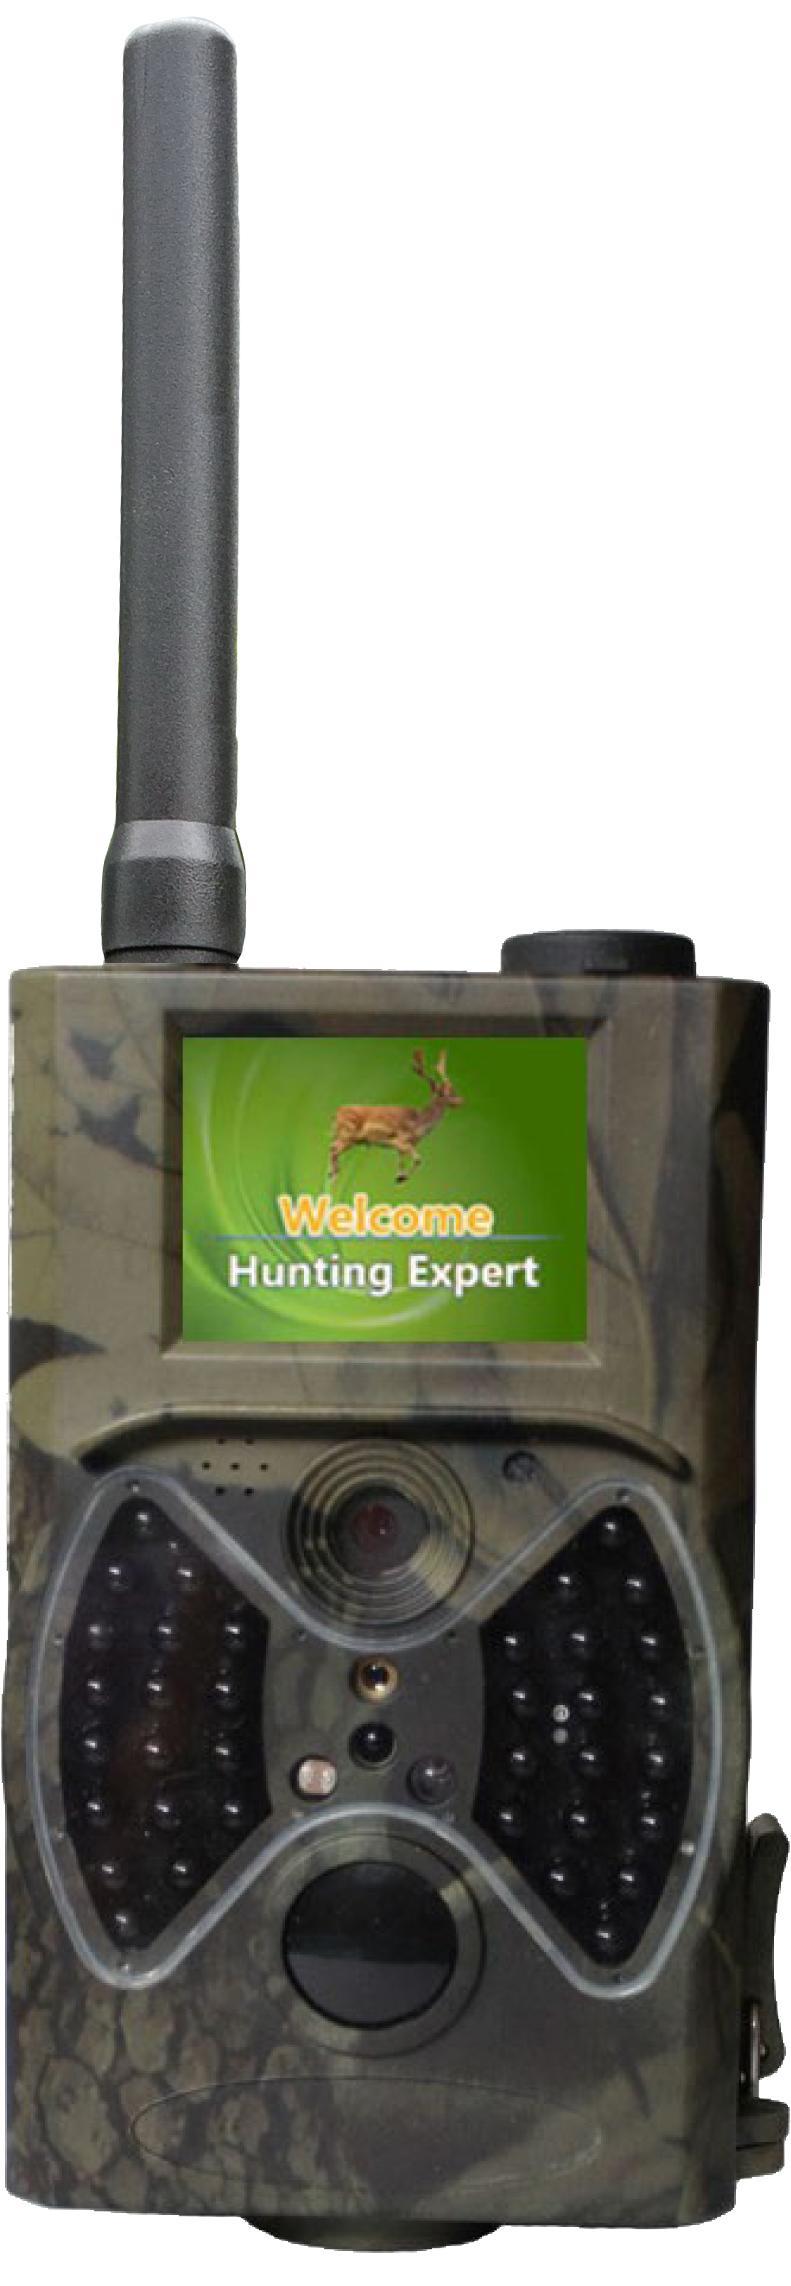 Denver WCM-5003 Wildlife Camera - WCM-5003 Digitālā kamera